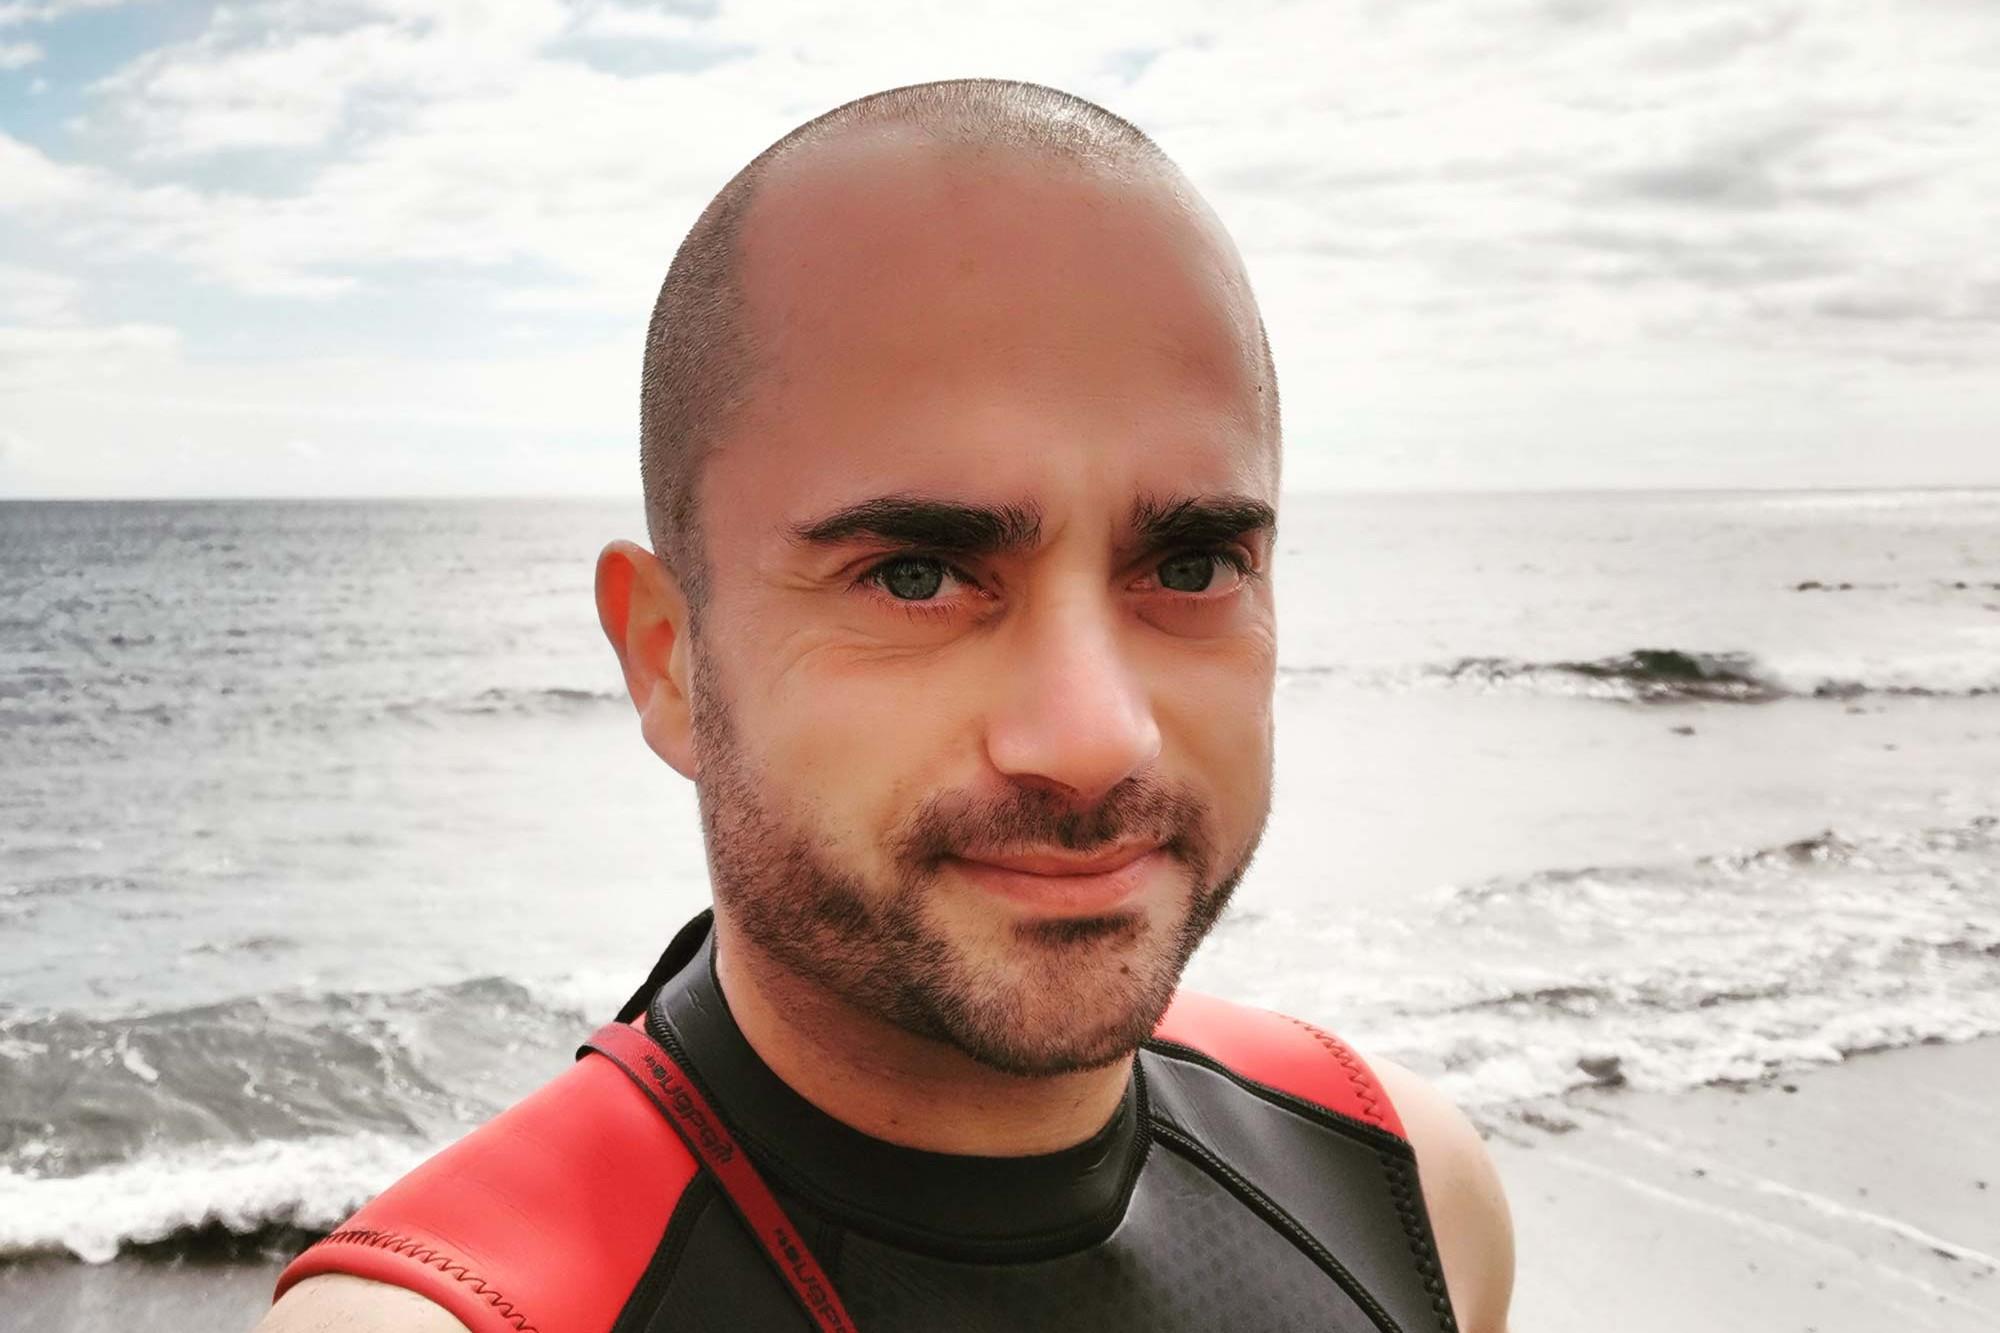 Leonardo Lauciello am Meer